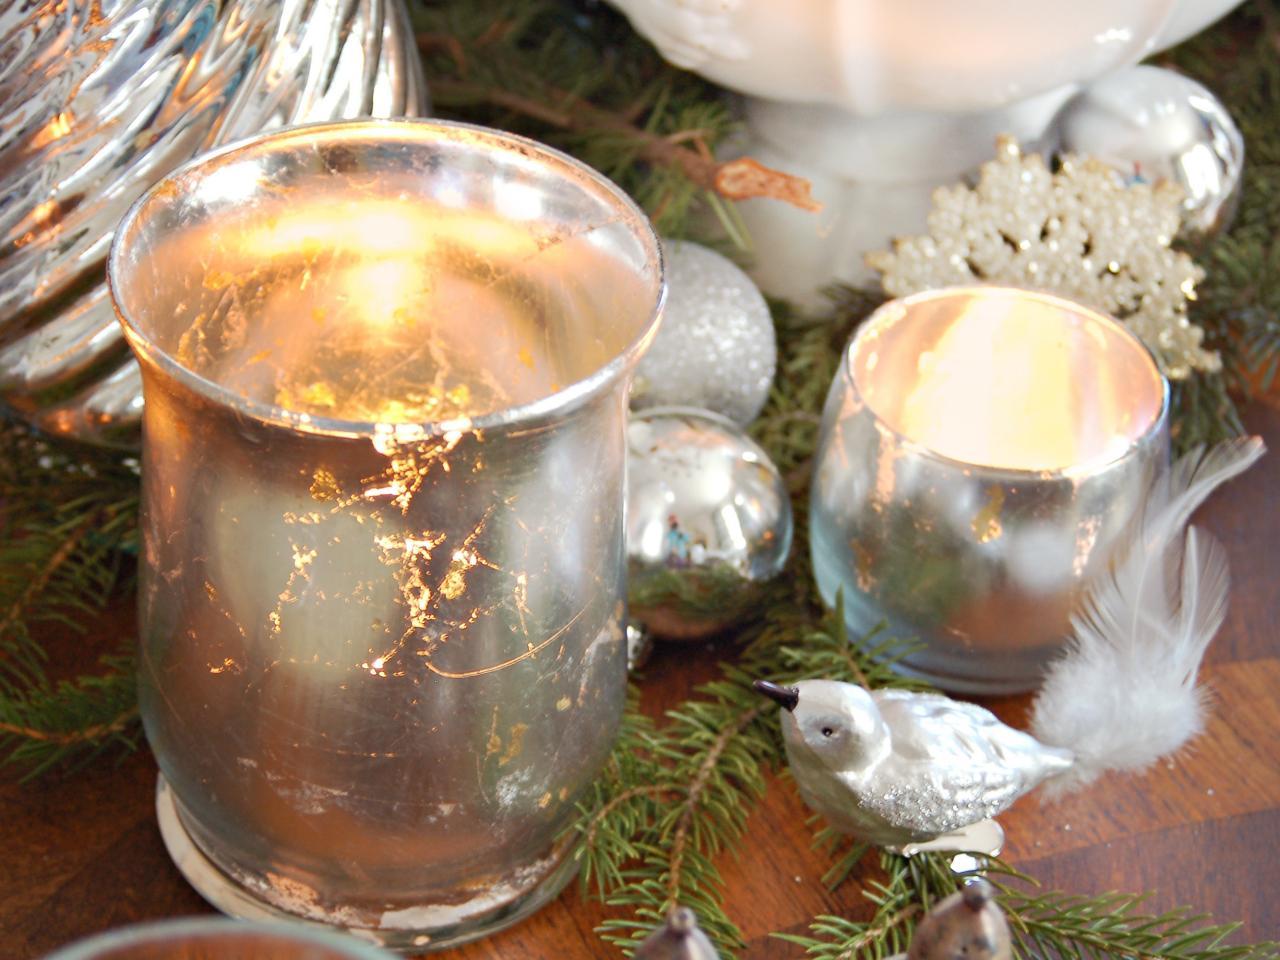 How to make mercury glass votives hgtv for Homemade votive candles